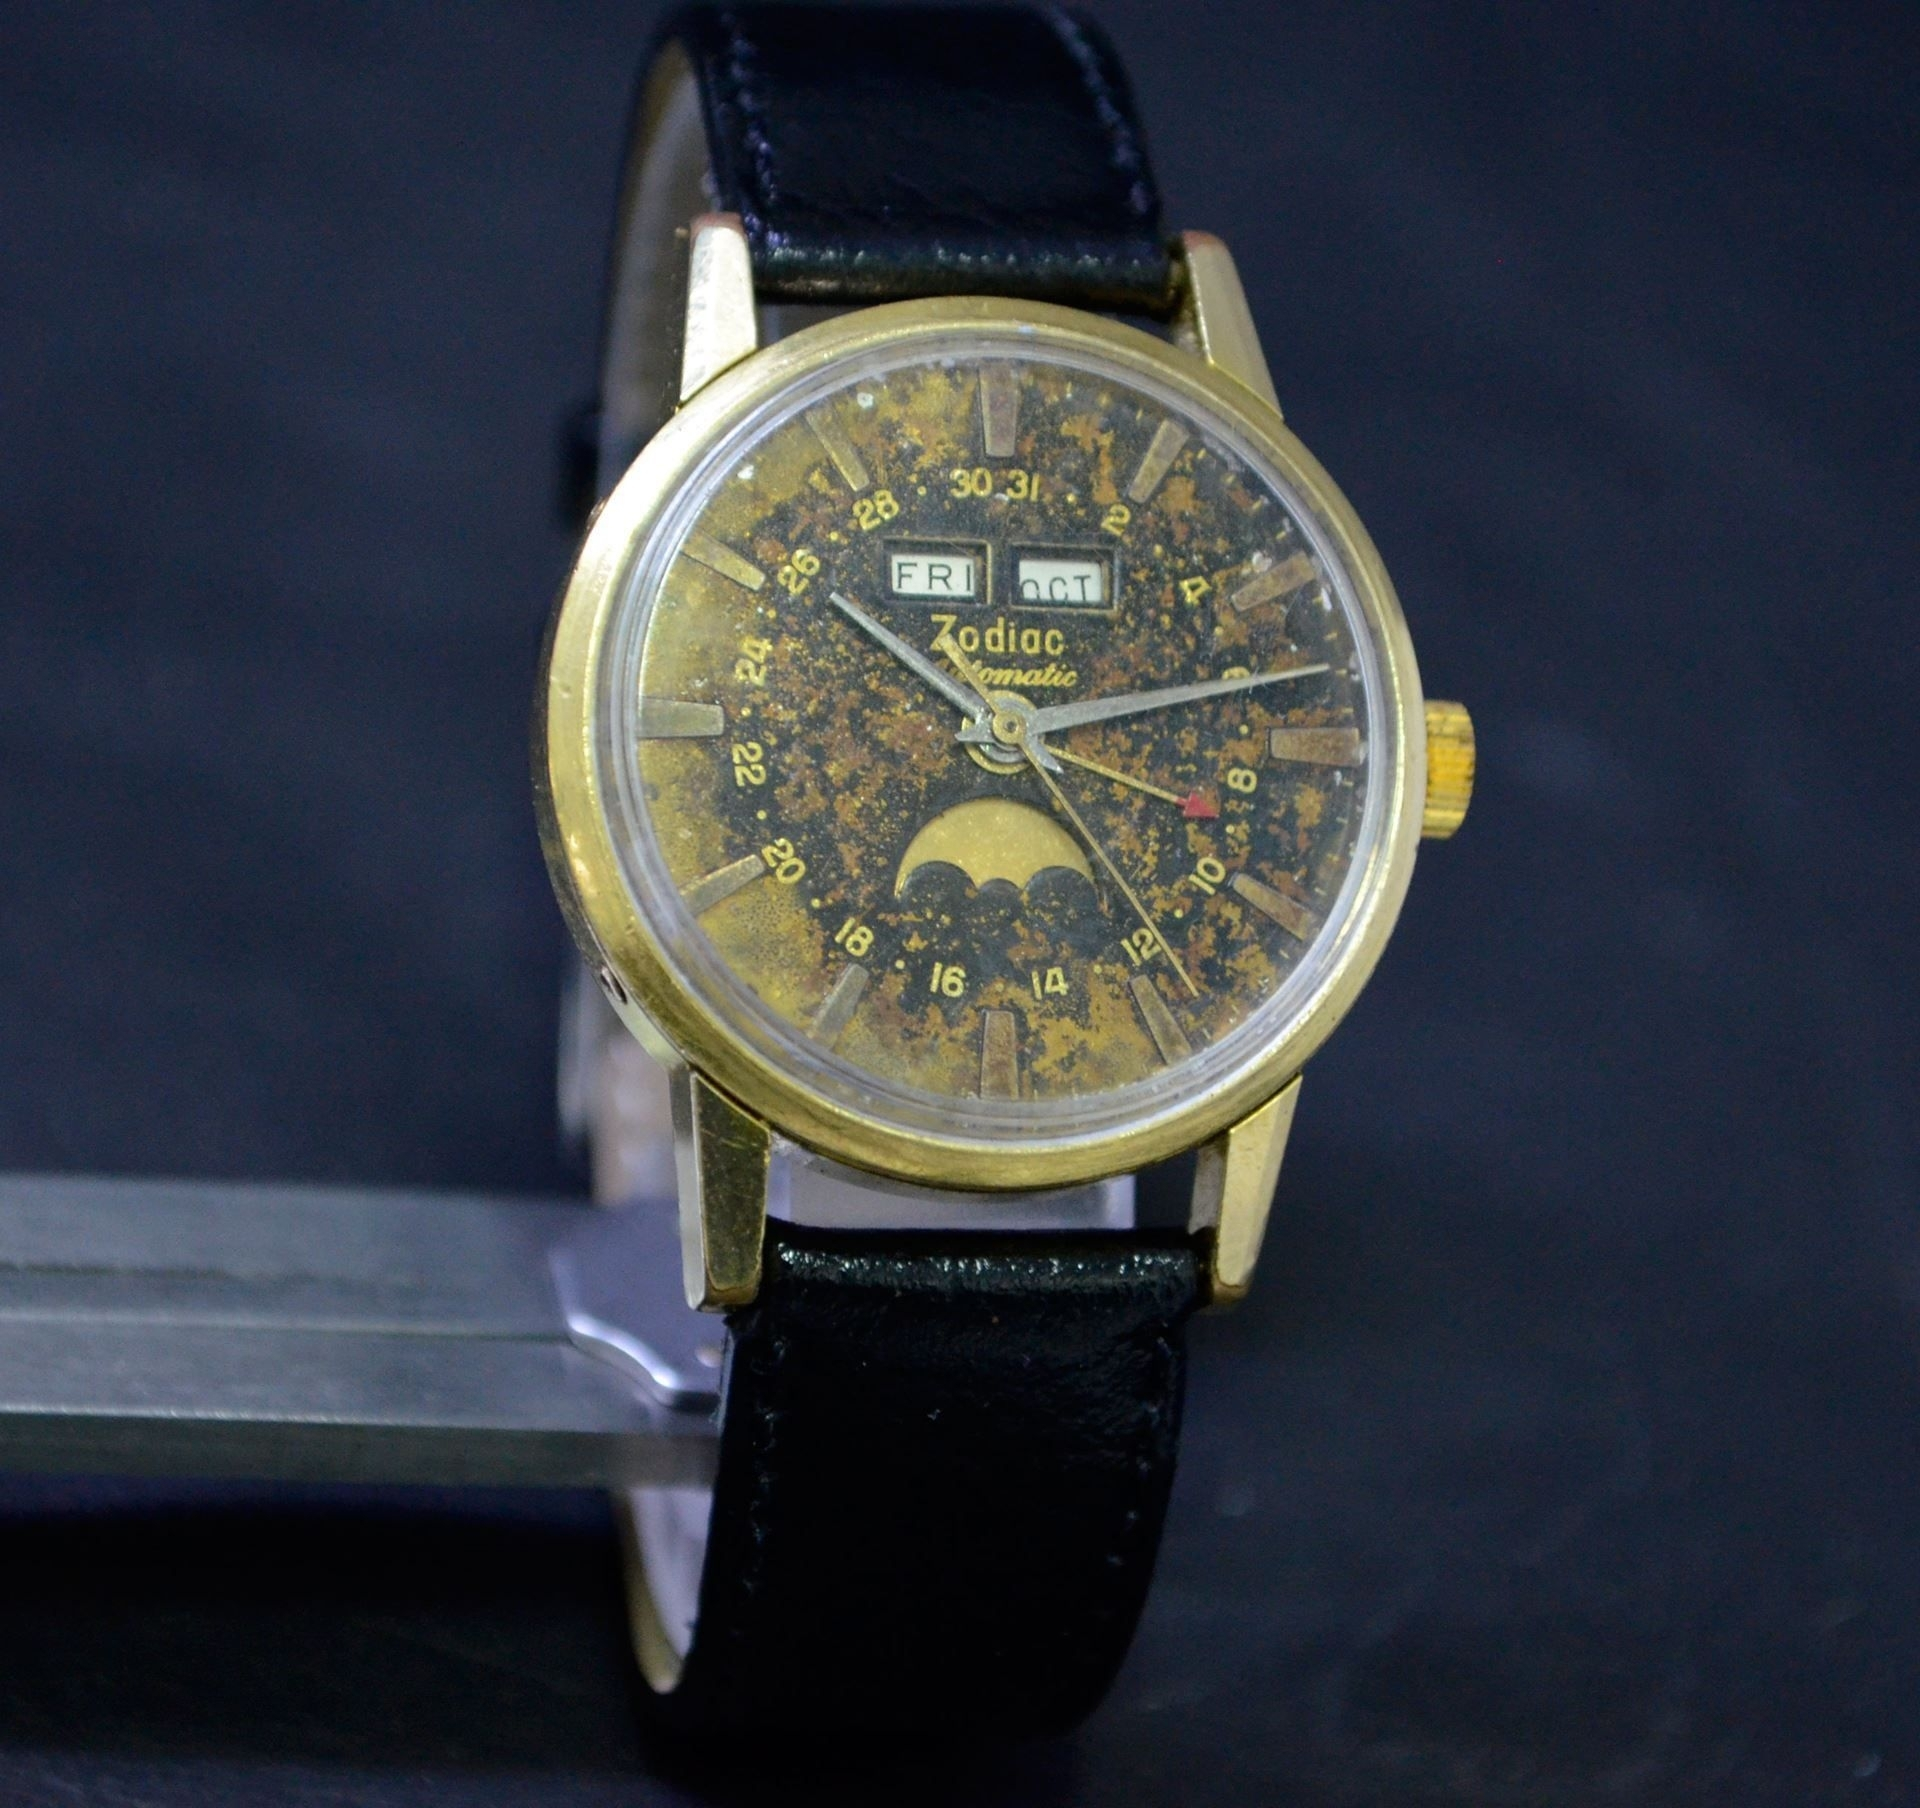 Zodiac Moon Phase Triple Date Automatic Swiss Watch | Moon